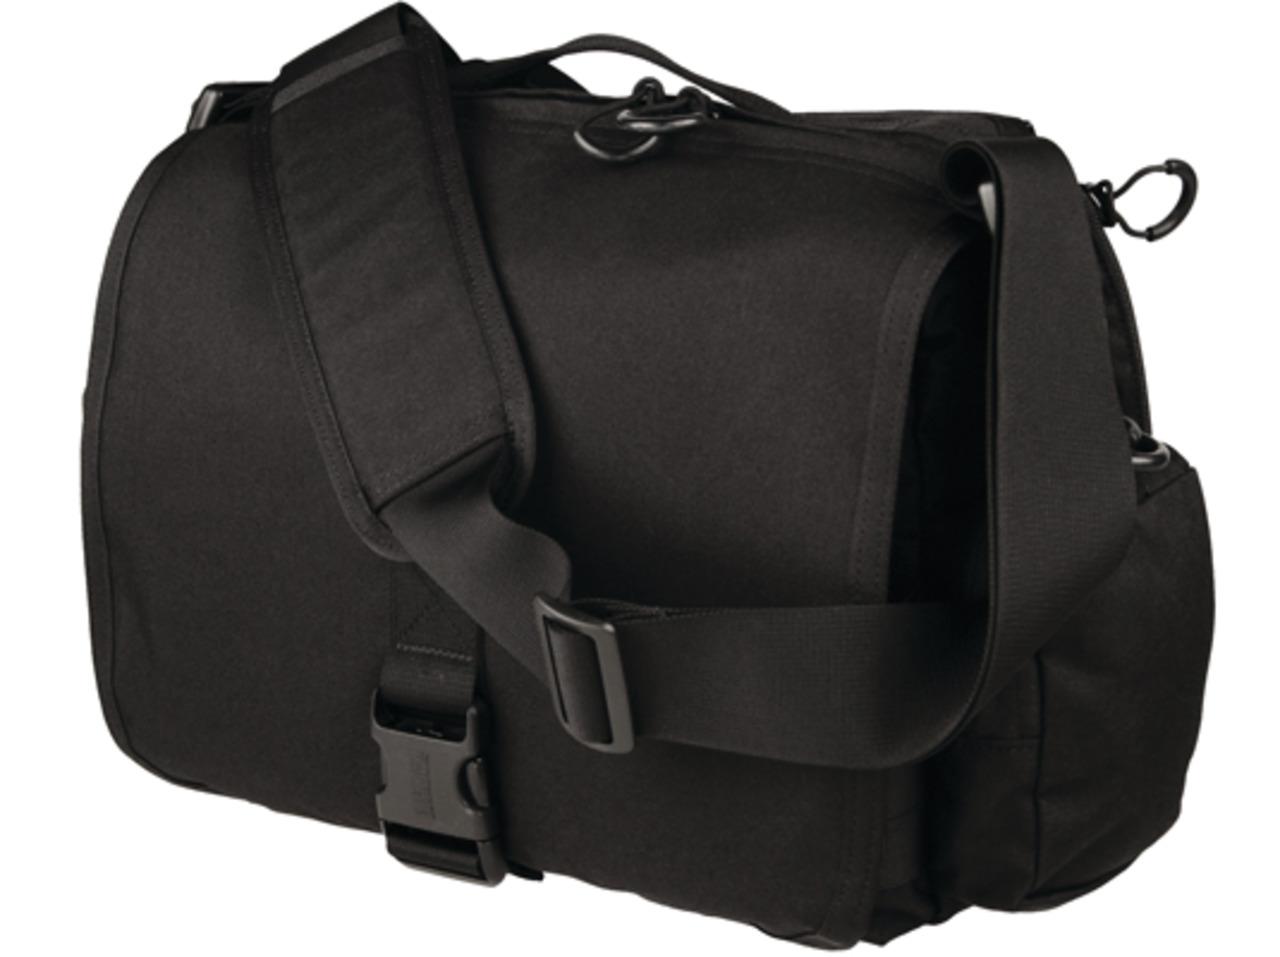 dcd485b180 Two Underappreciated Blackhawk Bags